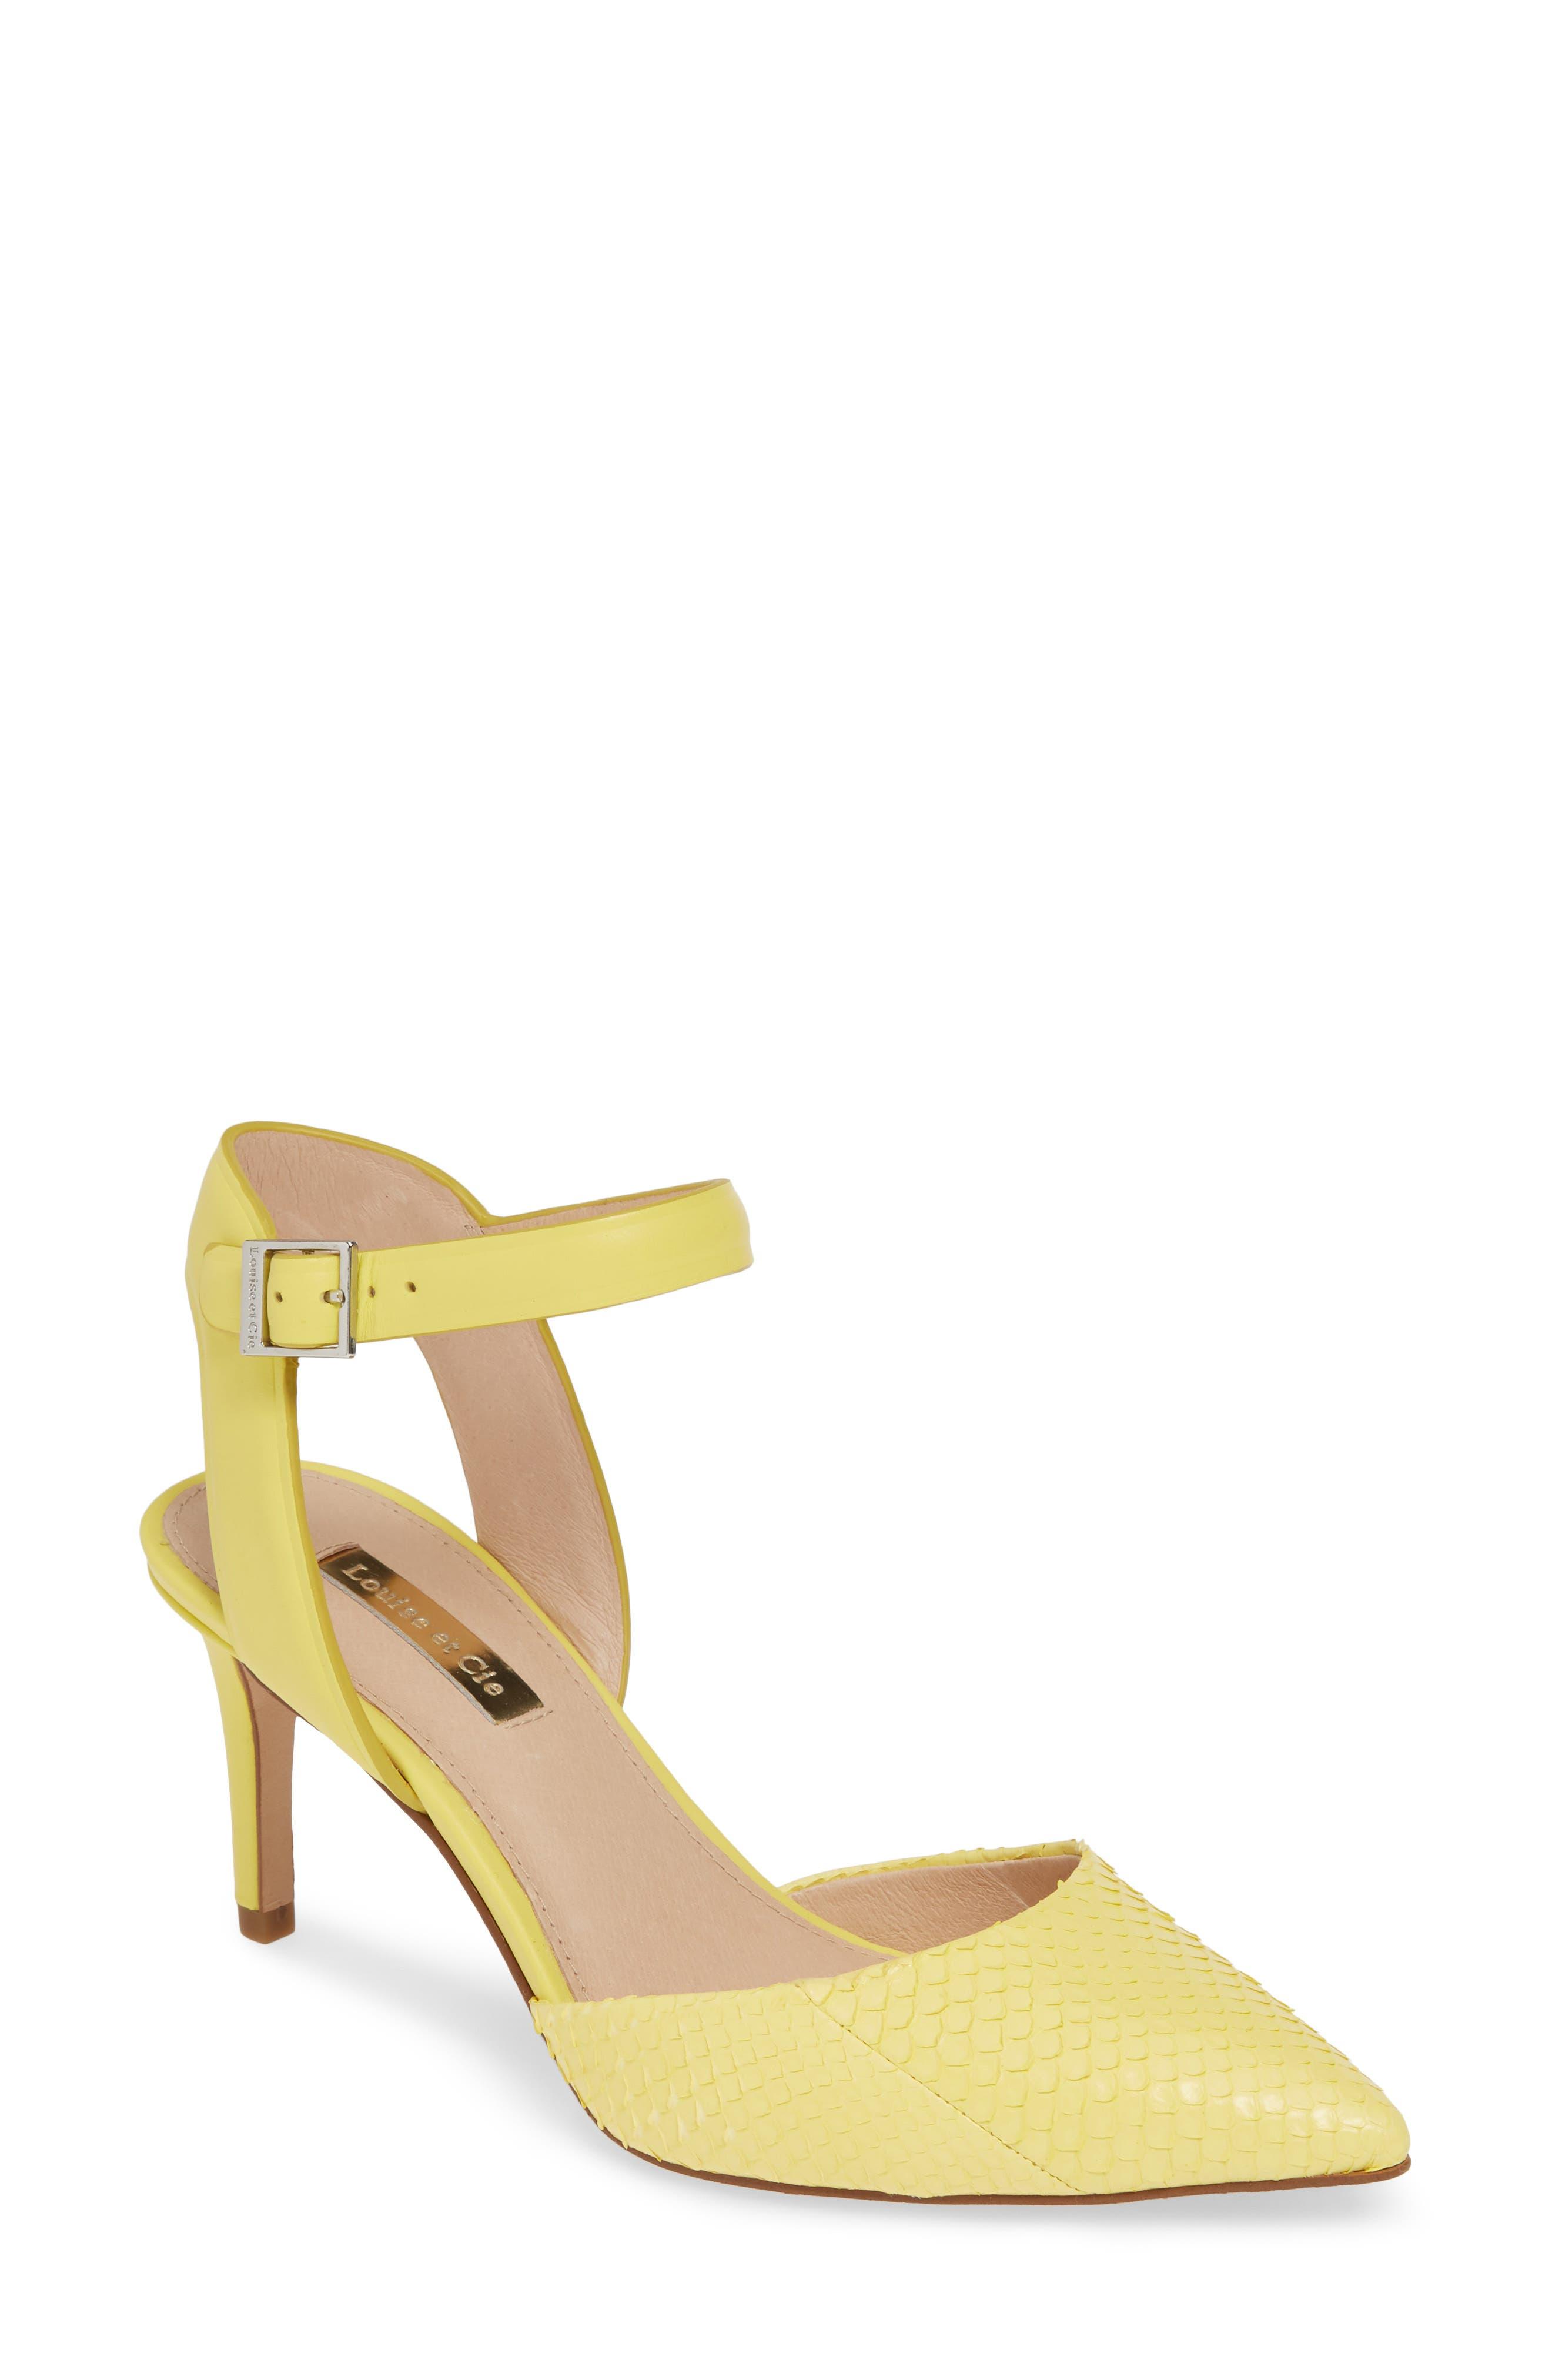 Louise Et Cie Kota Ankle Strap Pump, Yellow